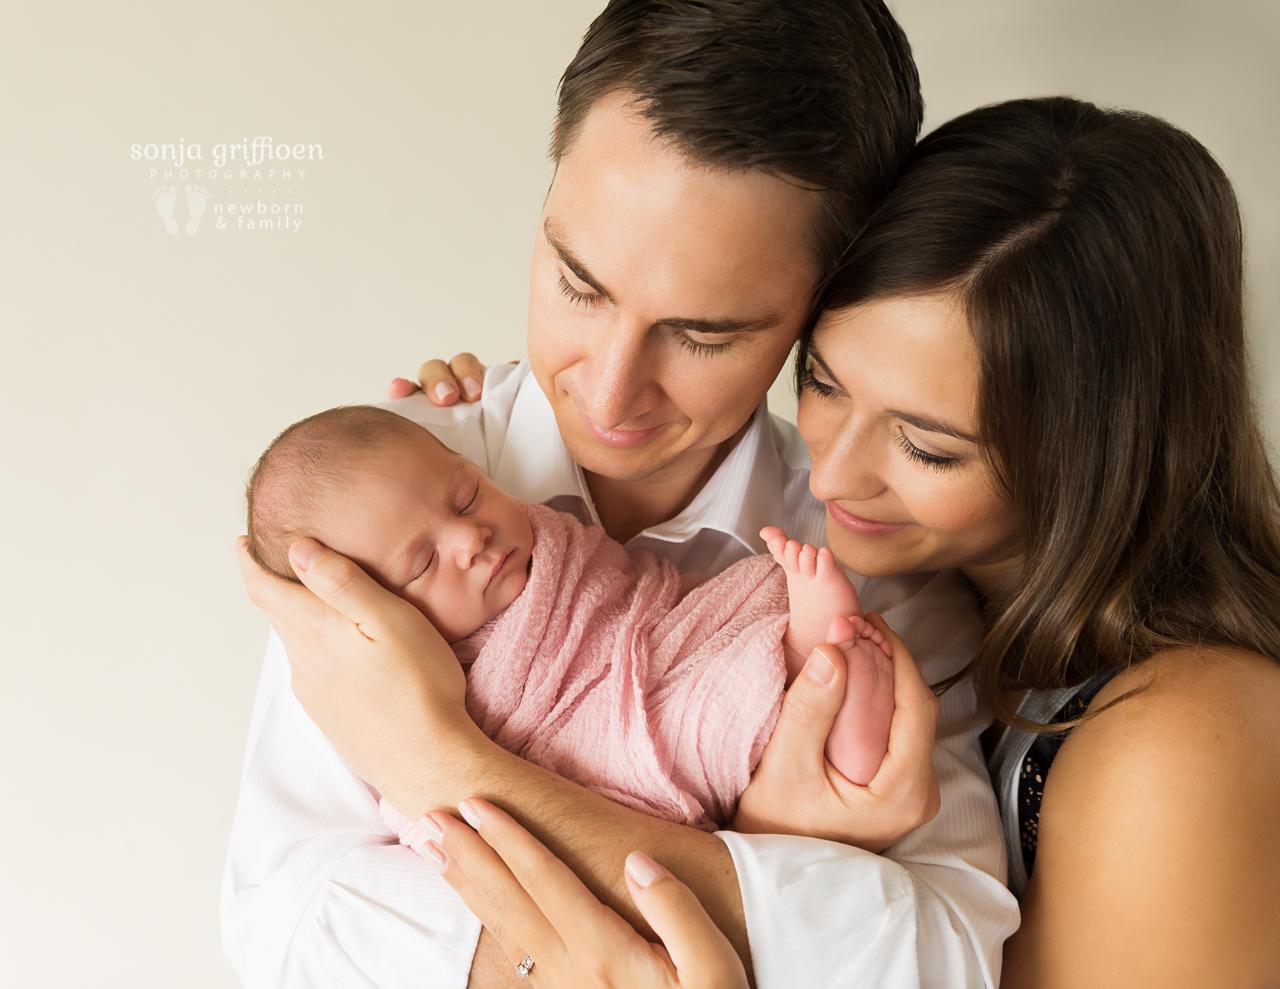 Thalia-Newborn-Brisbane-Newborn-Photographer-Sonja-Griffioen-431.jpg